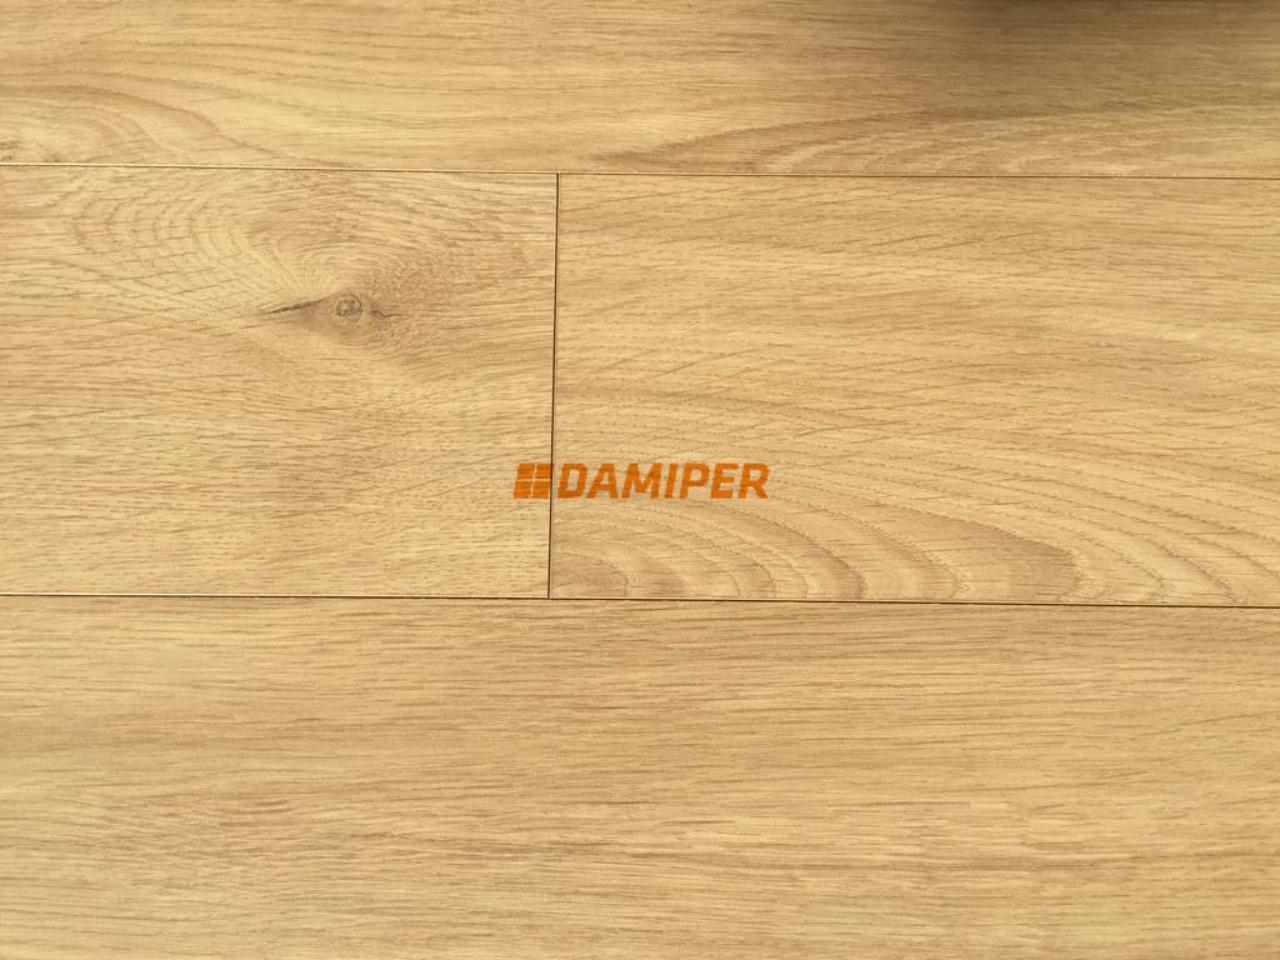 kompozitne_podlahy_h2o_floor_kronooriginal_1530_dub_bristol_damiper